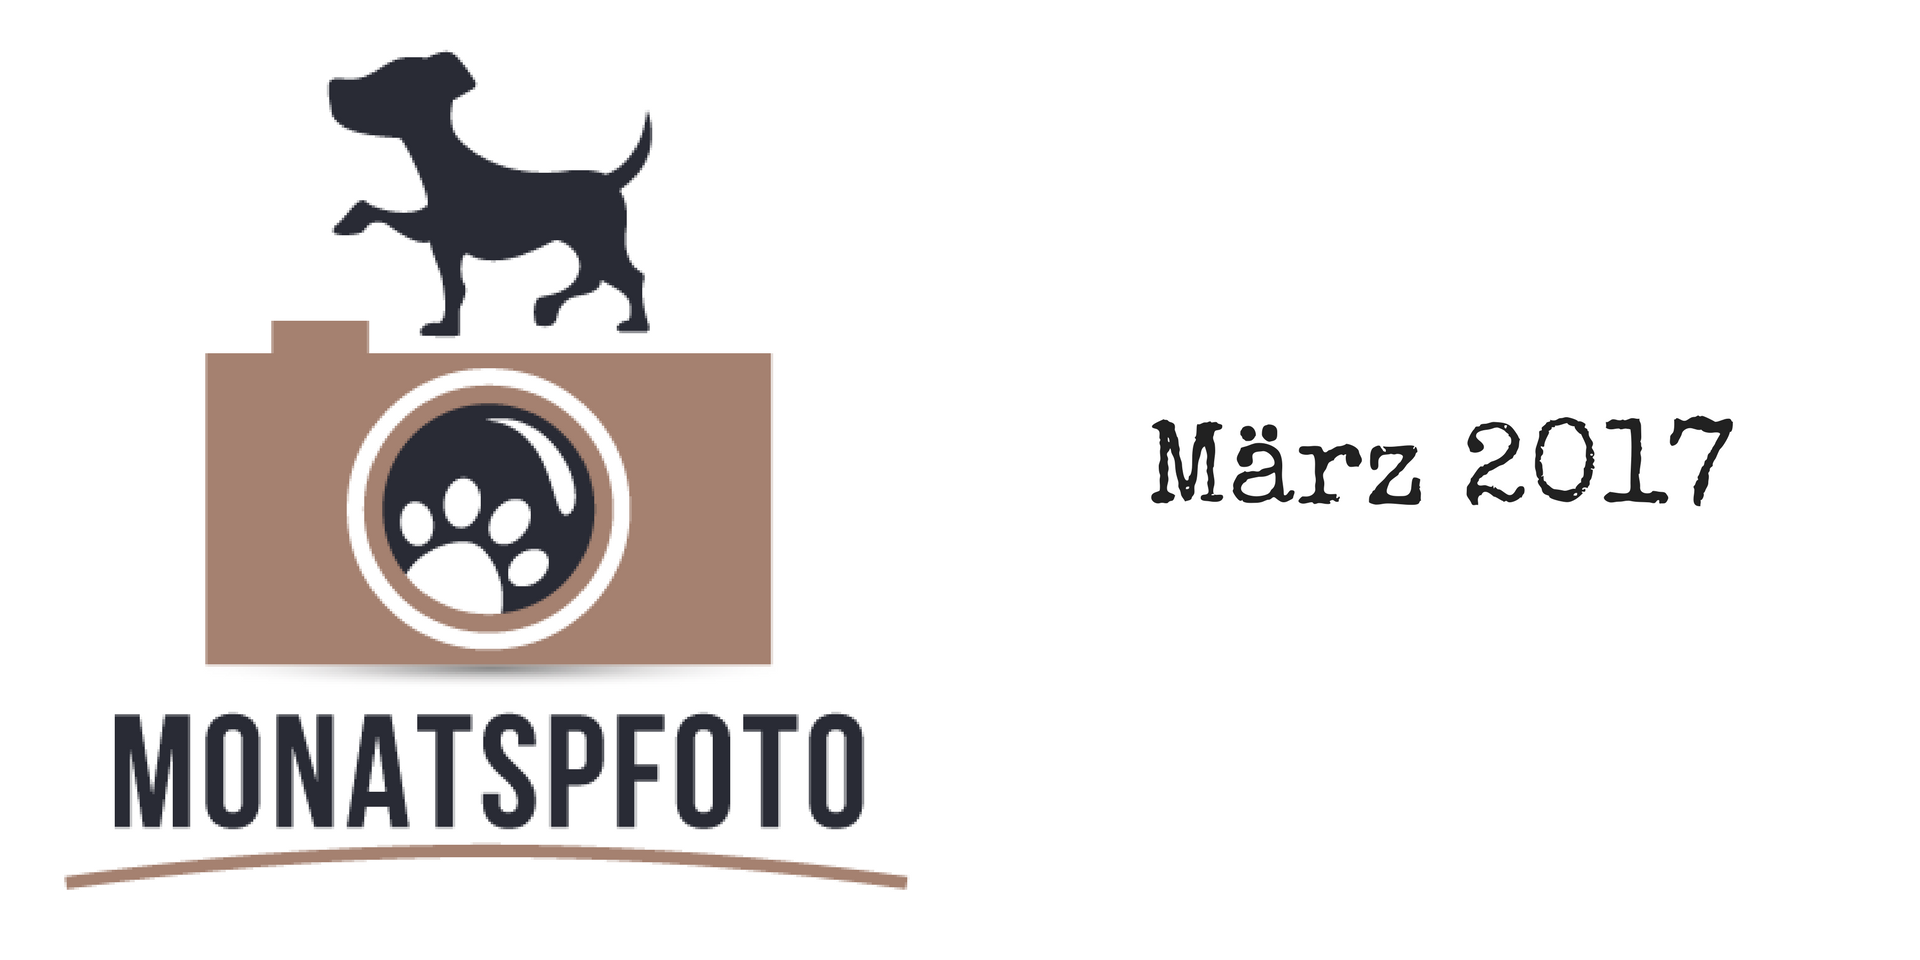 Monatspfoto März 2017 miDoggy Blog Community für Hunde